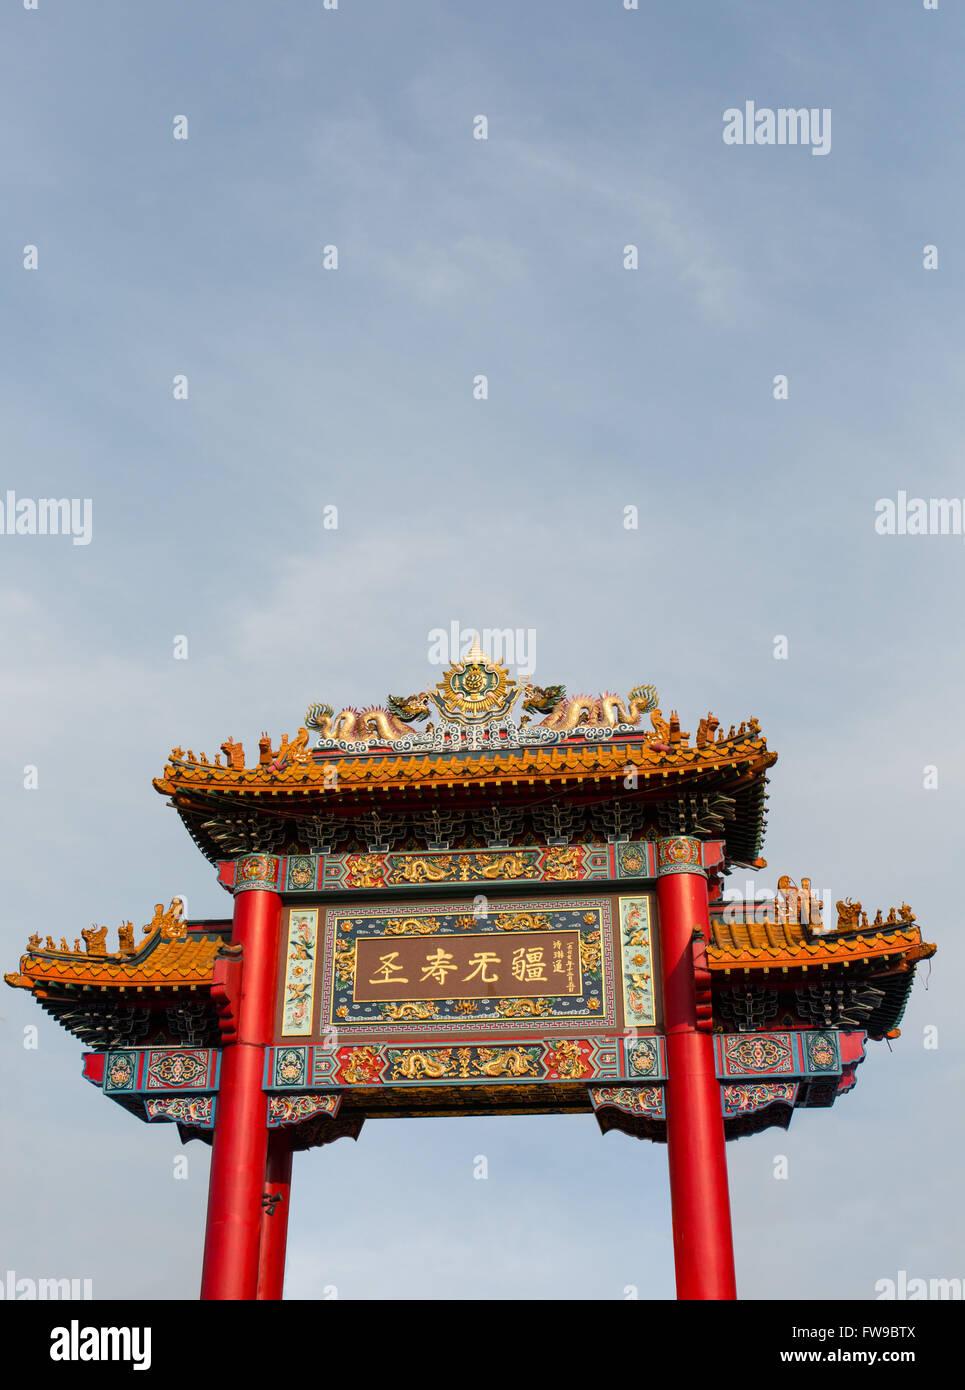 Chinatown Gate, entrance to Chinatown at Odeon Circle, District Samphanthawong, Bangkok, Thailand - Stock Image